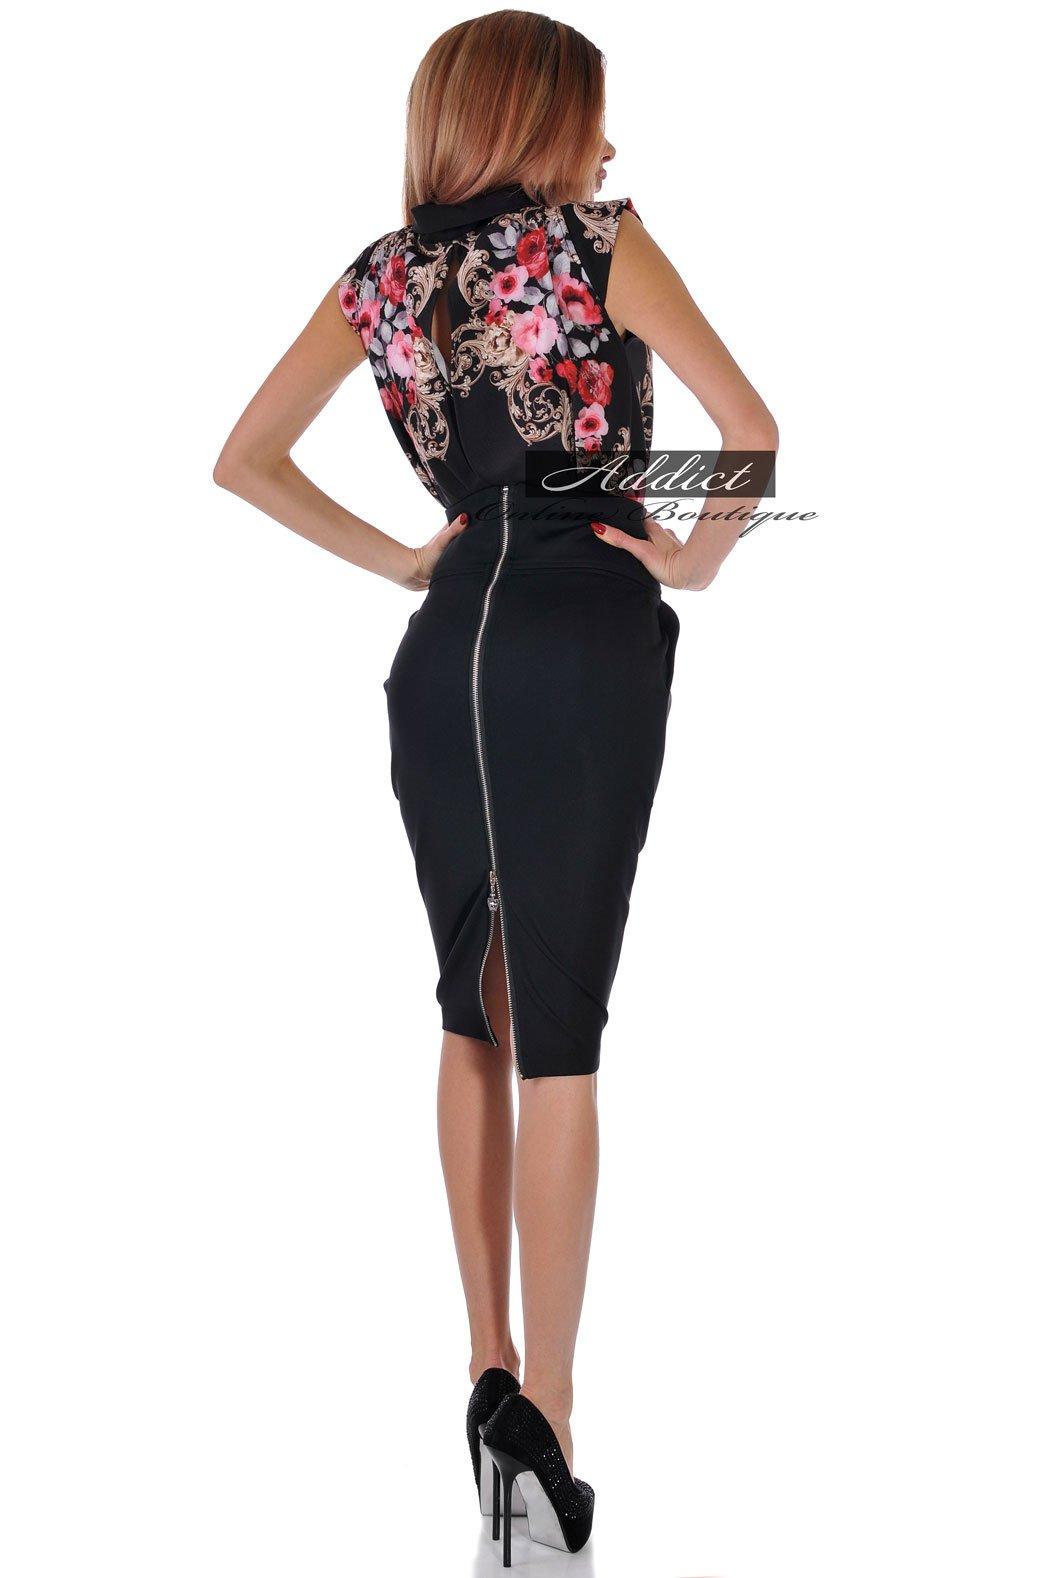 рокля елегантна с черна долница българско пройзводство